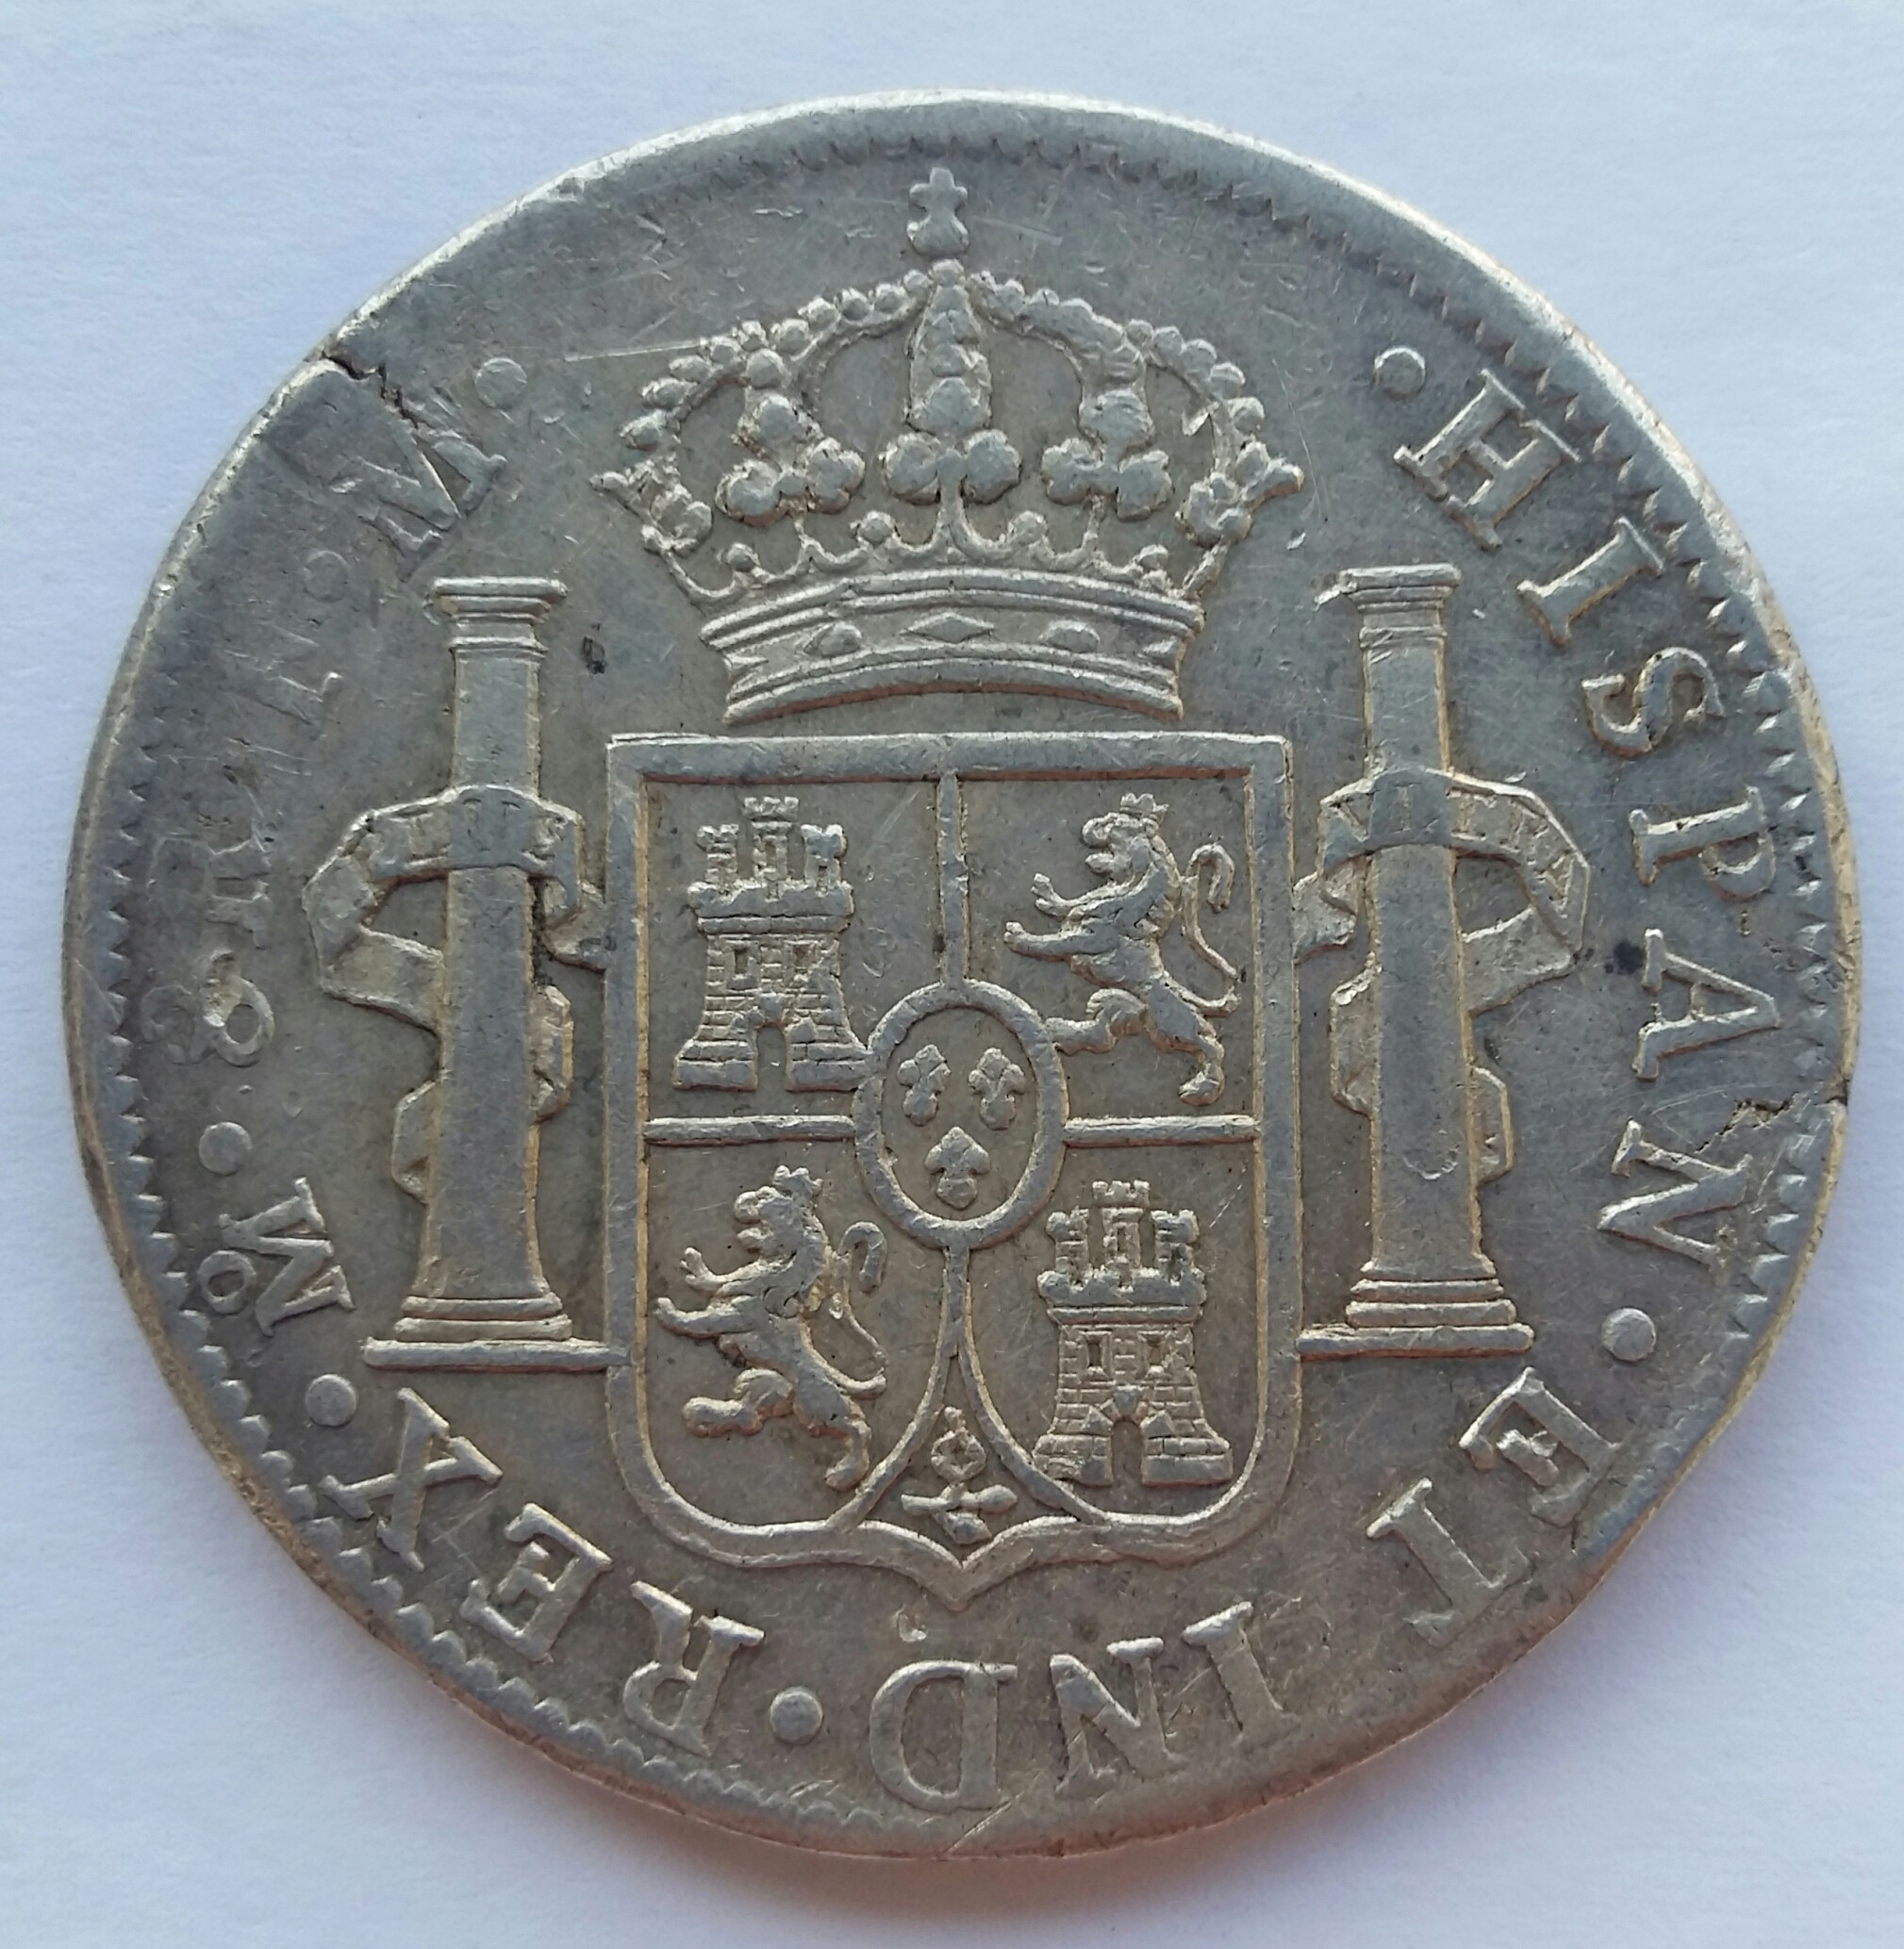 8 Reales 1798. Carlos IV. Mexico FM 20200116